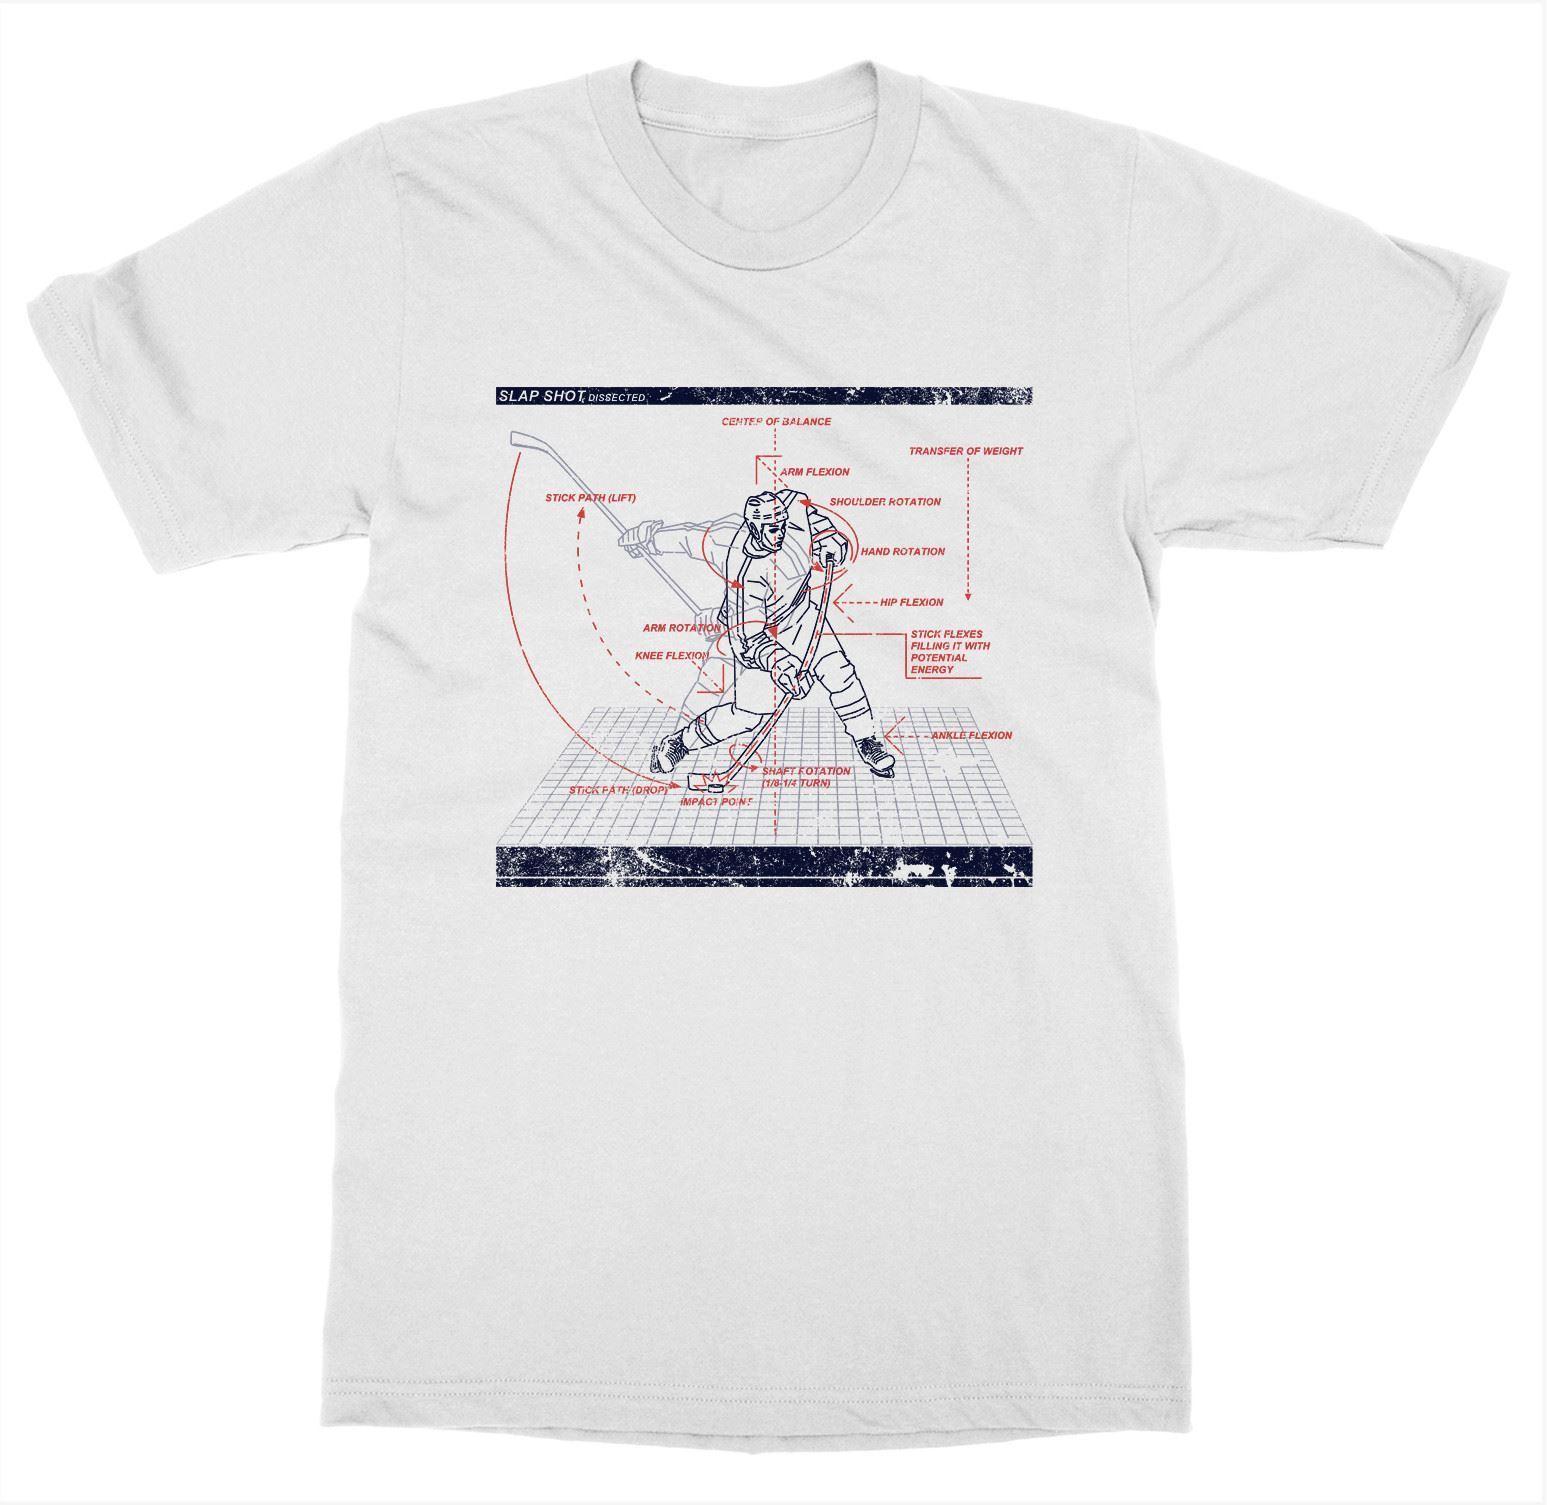 2019 Pop algodón hombre Camiseta Slapshot disected camiseta hockey Goon pista de hielo Skate Playoff árbitro Puckfunny camisetas